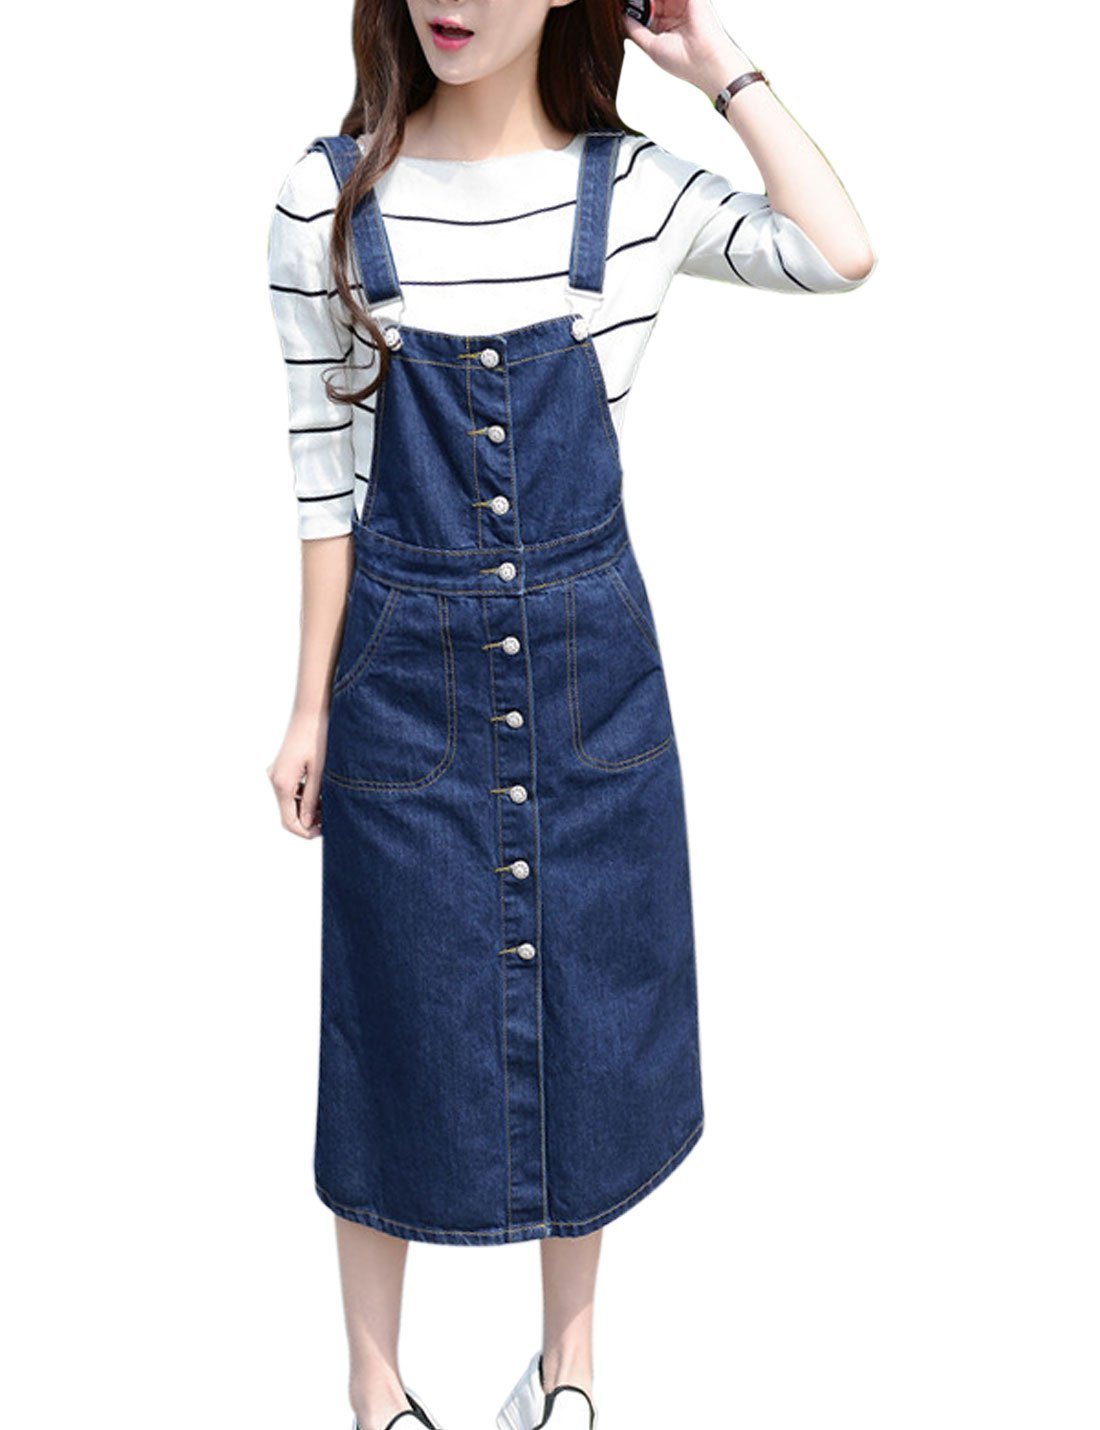 3d8b960fe62 Yeokou Women s Midi Length Long Denim Jeans Jumpers Overall Pinafore Dress  Skirt